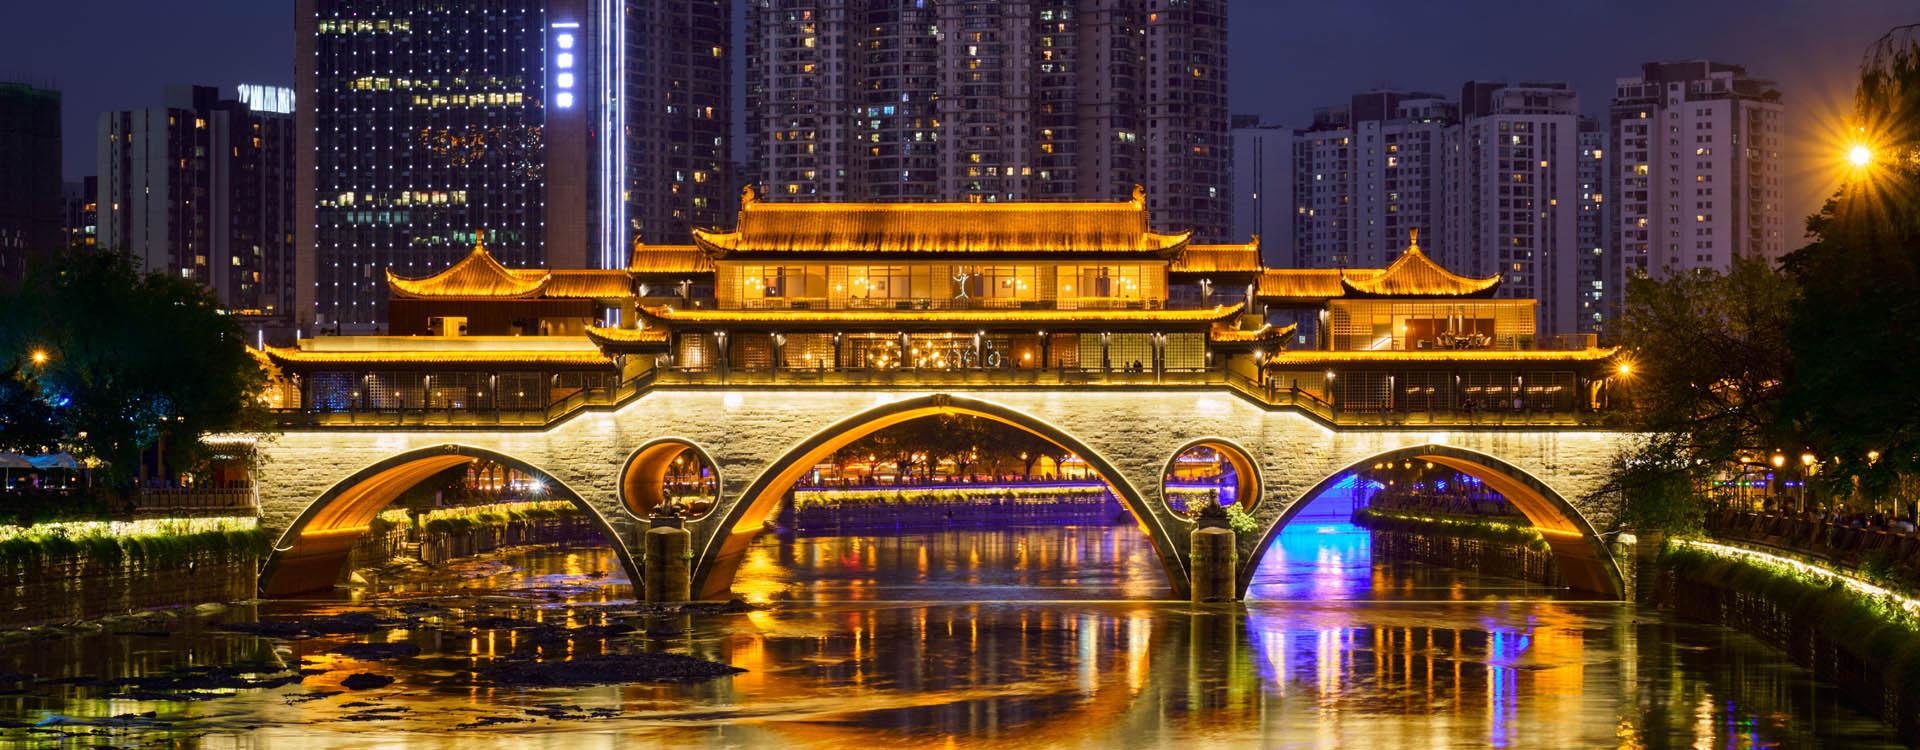 China, Chengdu, Jiuzhaigou National Park, clear water lakes